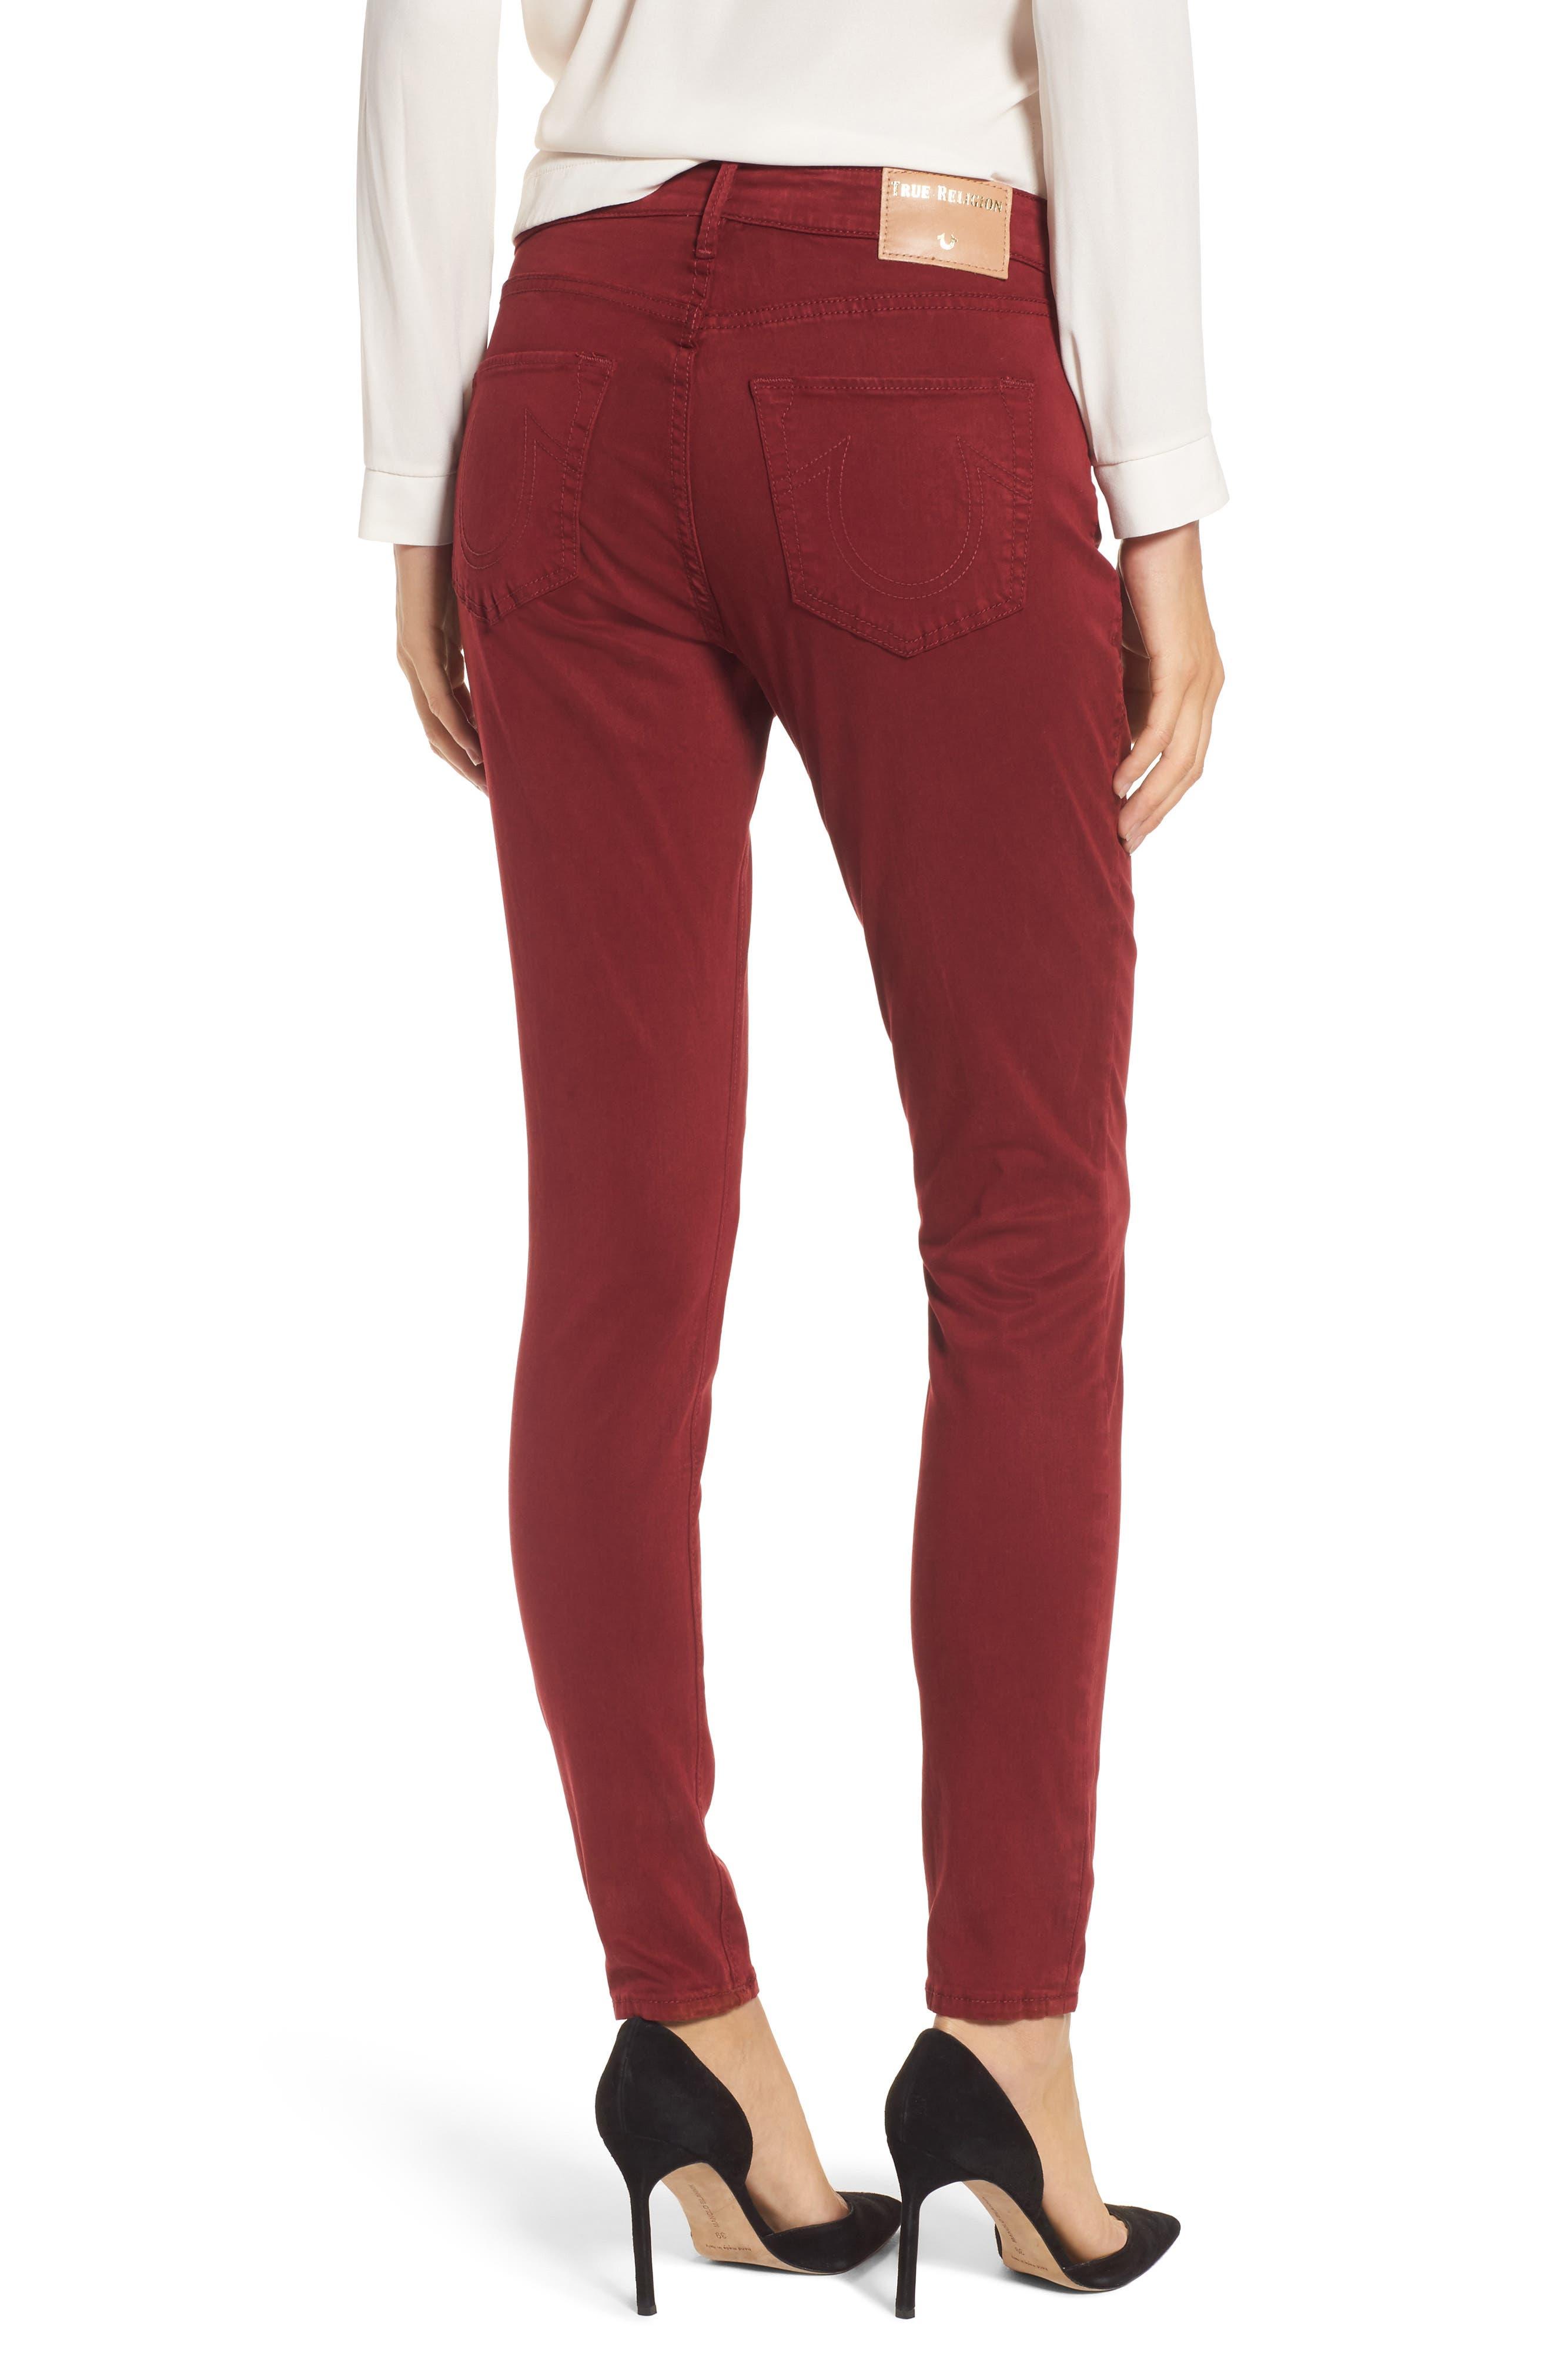 Jennie Curvy Skinny Jeans,                             Alternate thumbnail 2, color,                             640